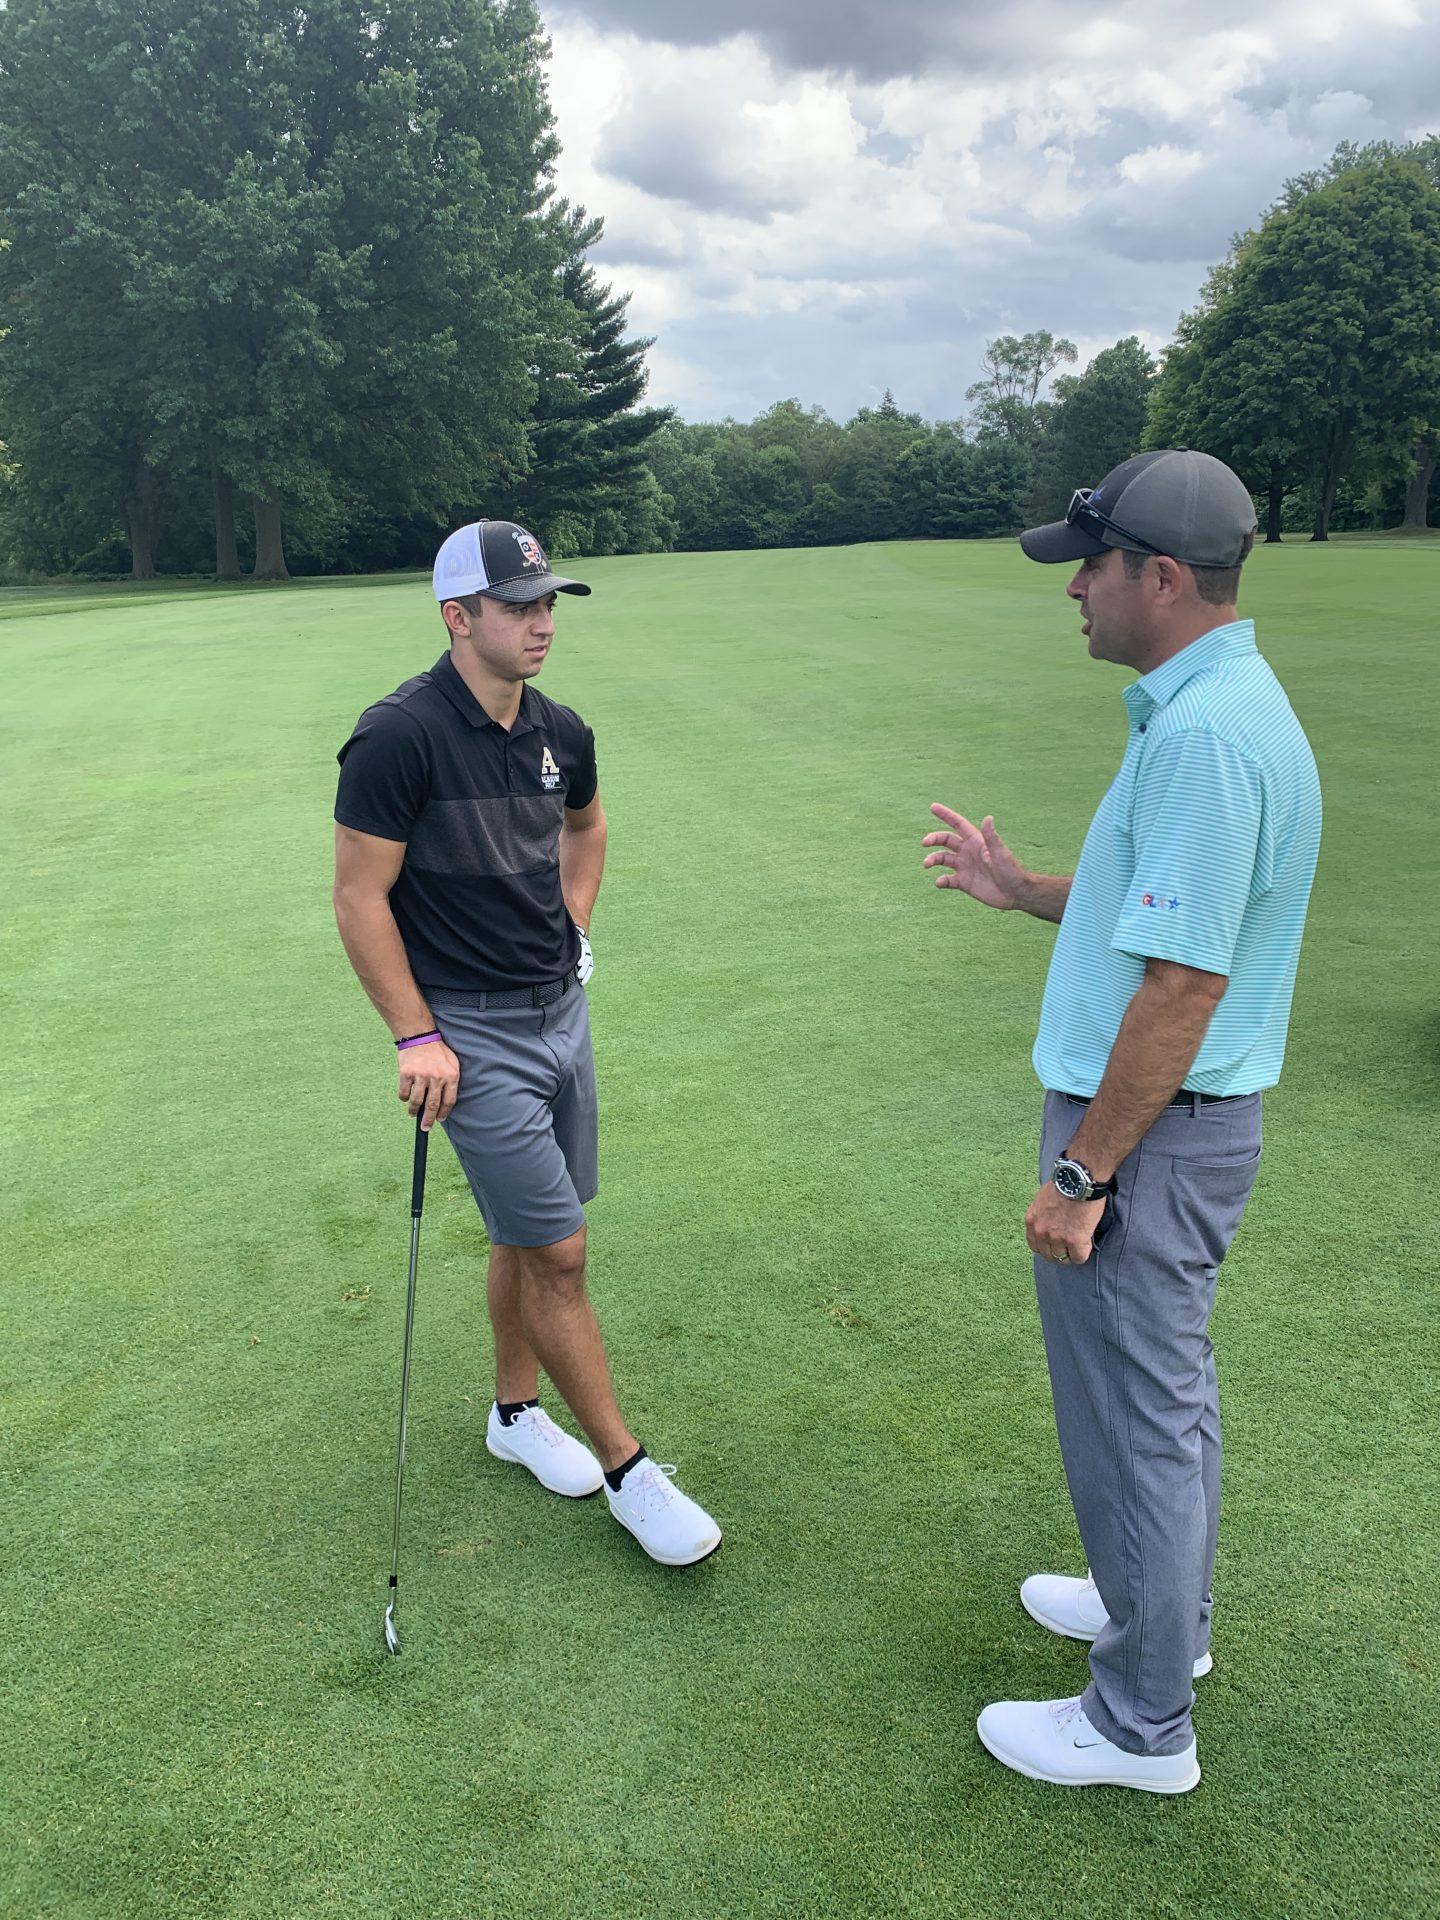 Golf Lessons Near Me - Novi, Michigan